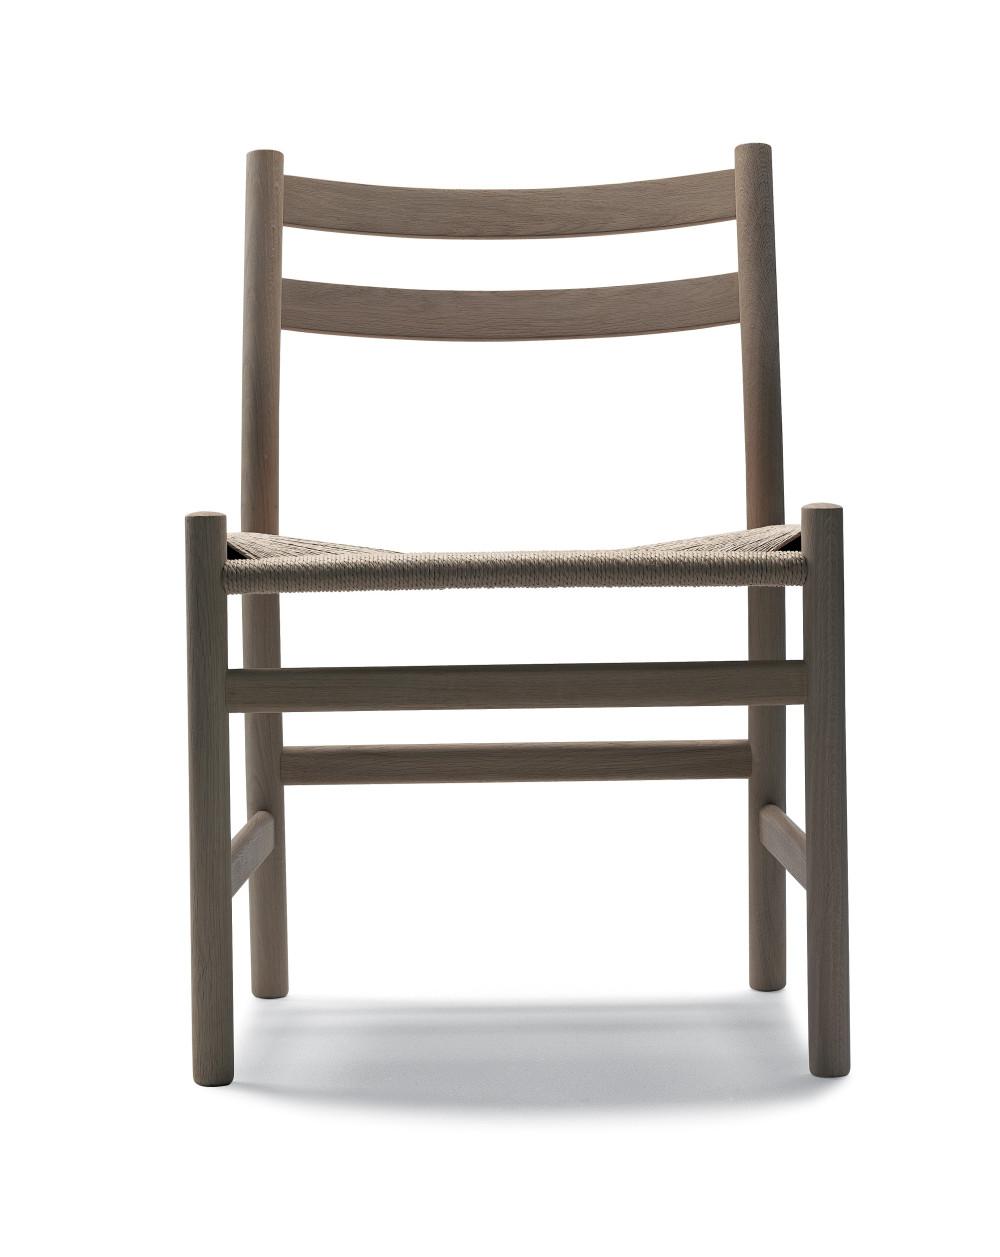 chair Bolling CH46 Hans J Wegner